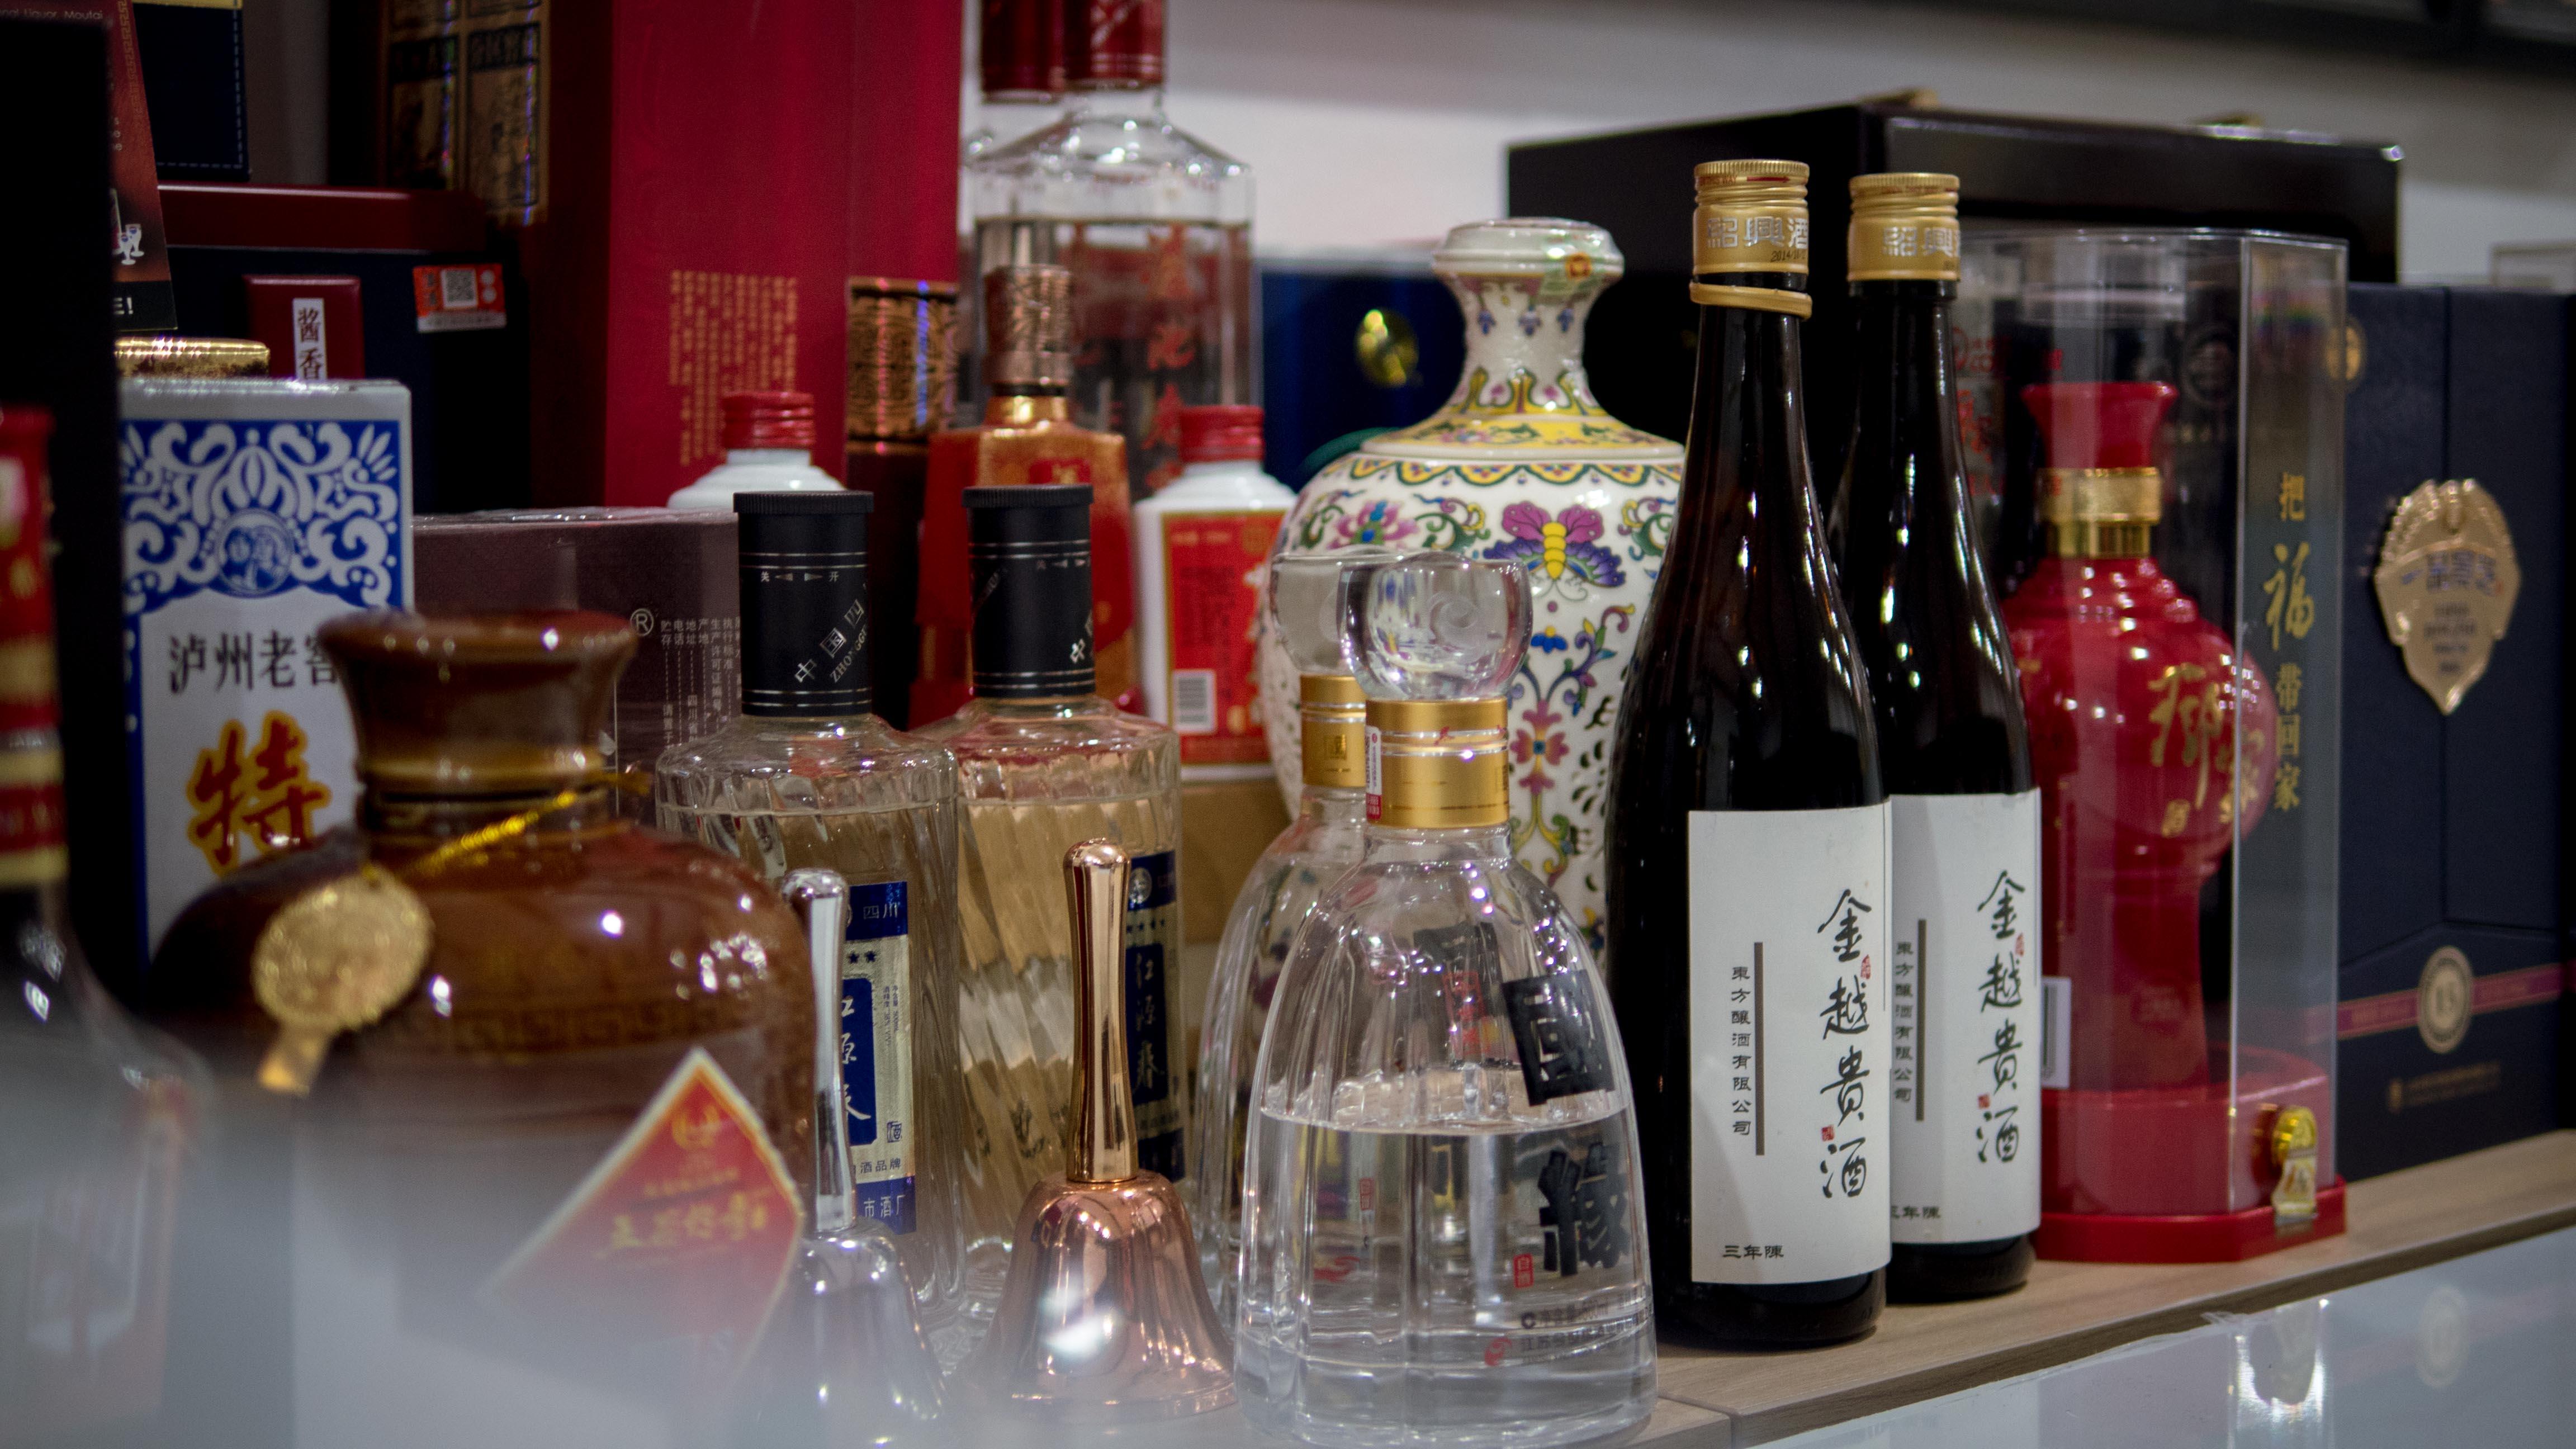 Meet Baijiu, The Bestselling Liquor S'pore Has Never Tasted